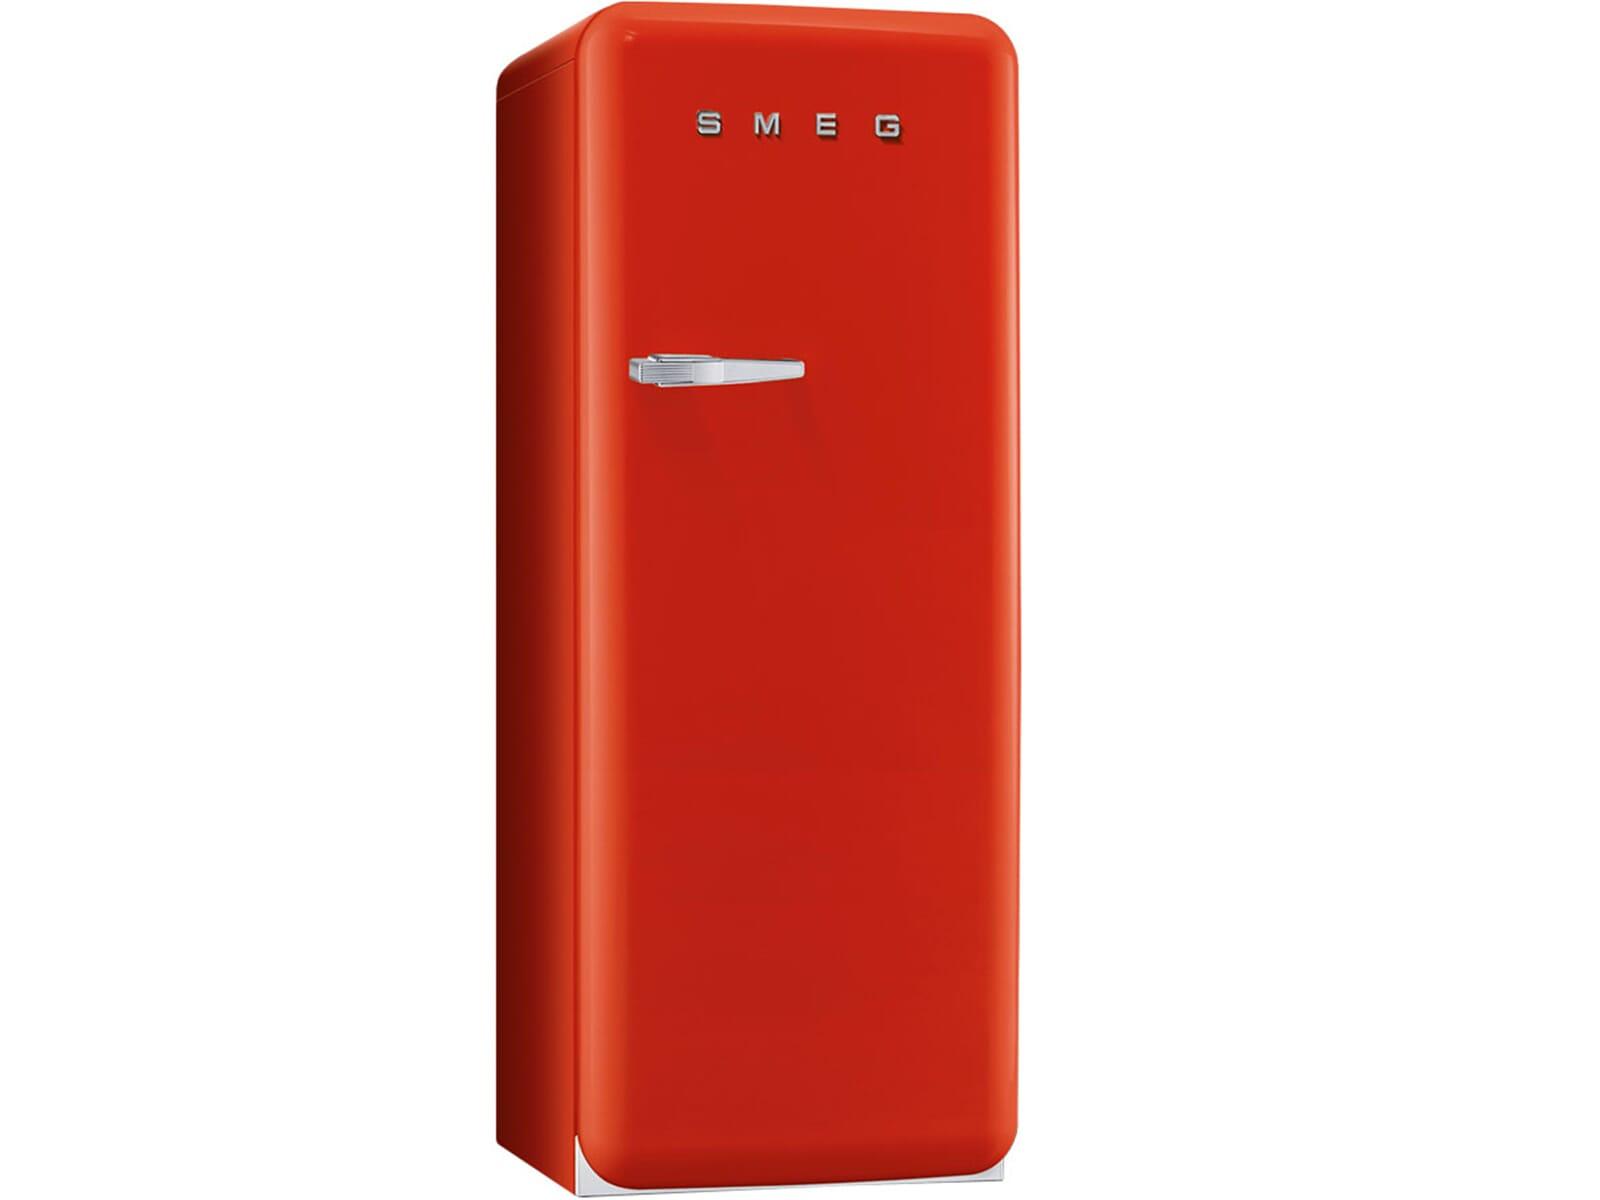 Amerikanischer Kühlschrank Türkis : Amerikanischer kühlschrank rot hashimoto kimberly